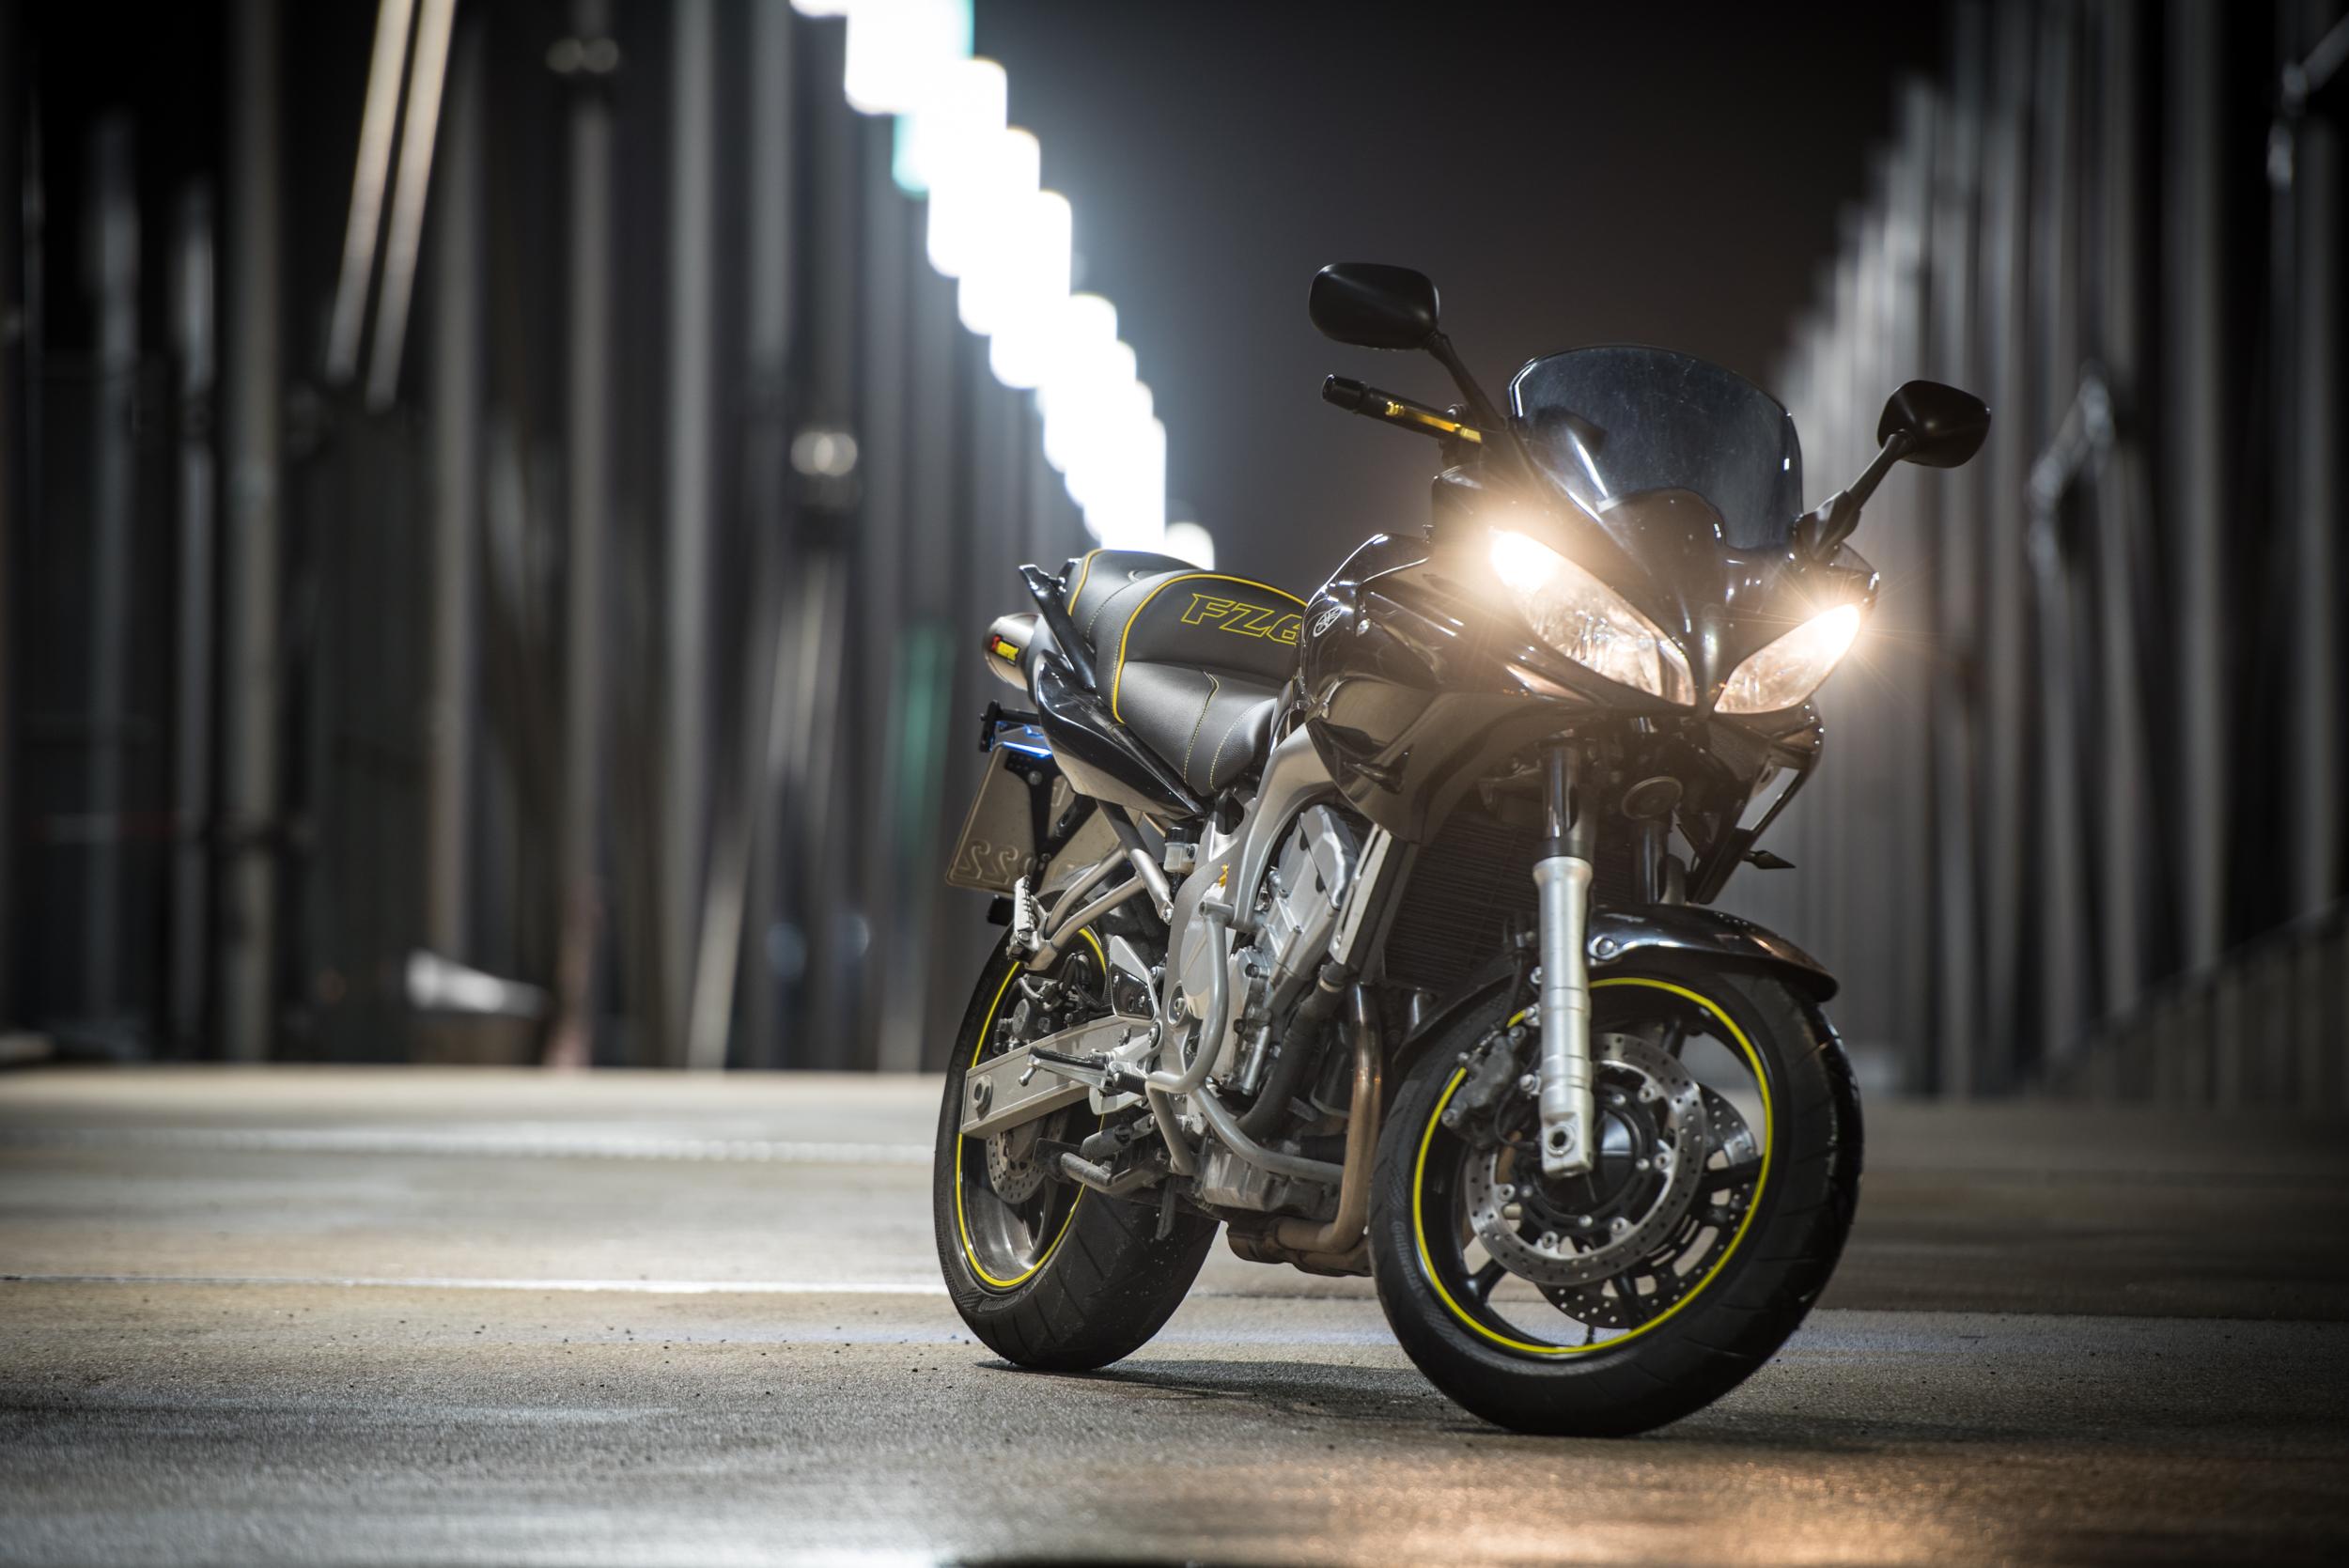 Review: Yamaha FZ6 Fazer